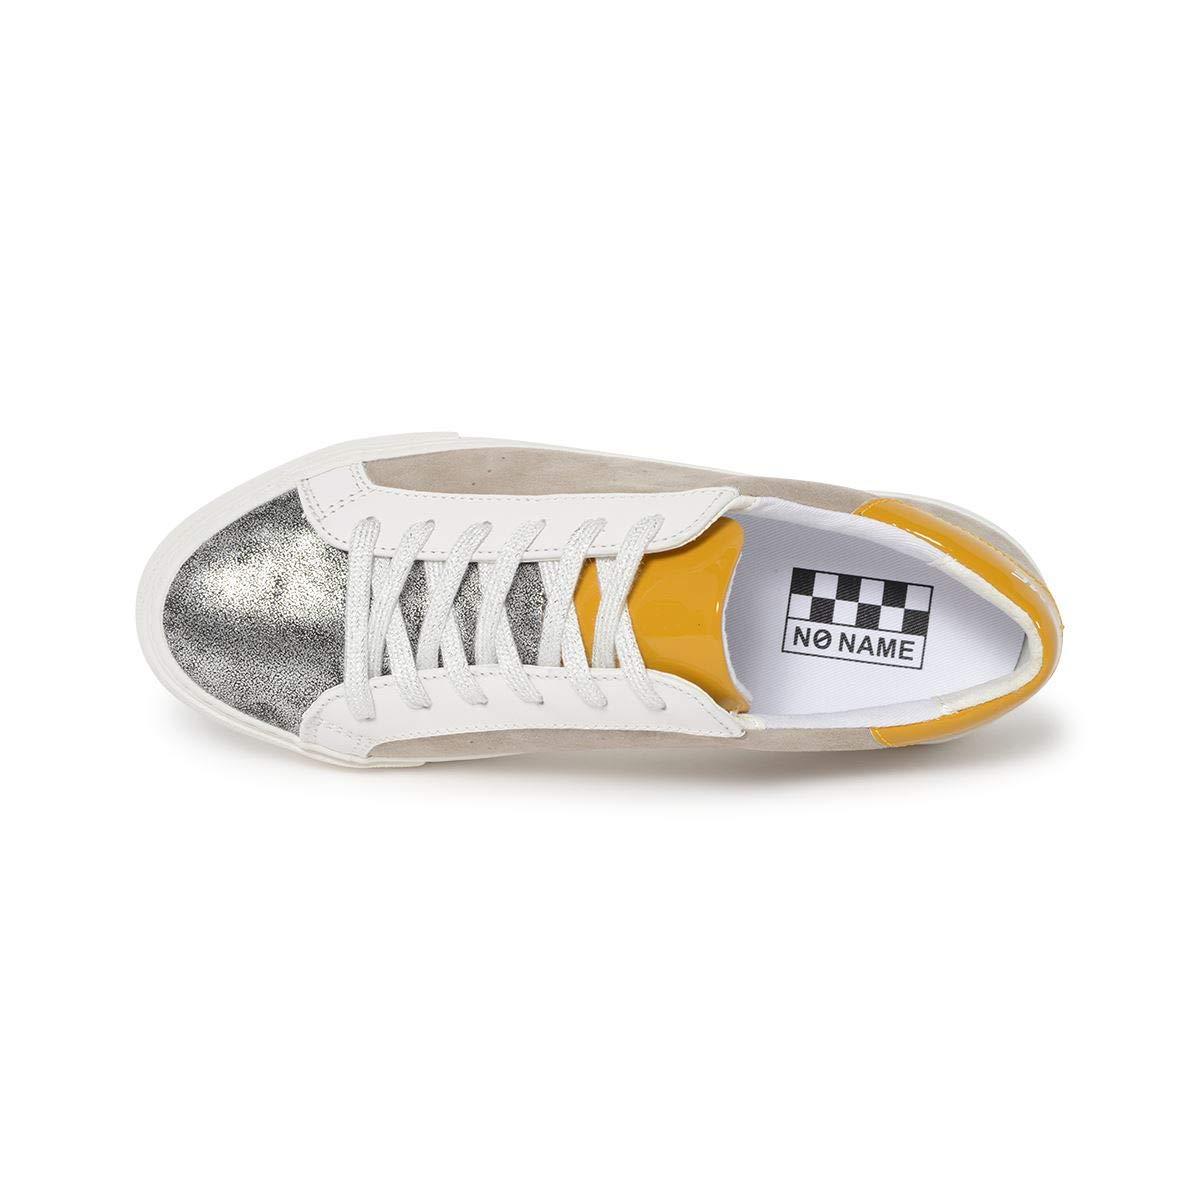 Sneaker Mode Femme Name Arcade GloomBaskets No 8kXwOP0nN